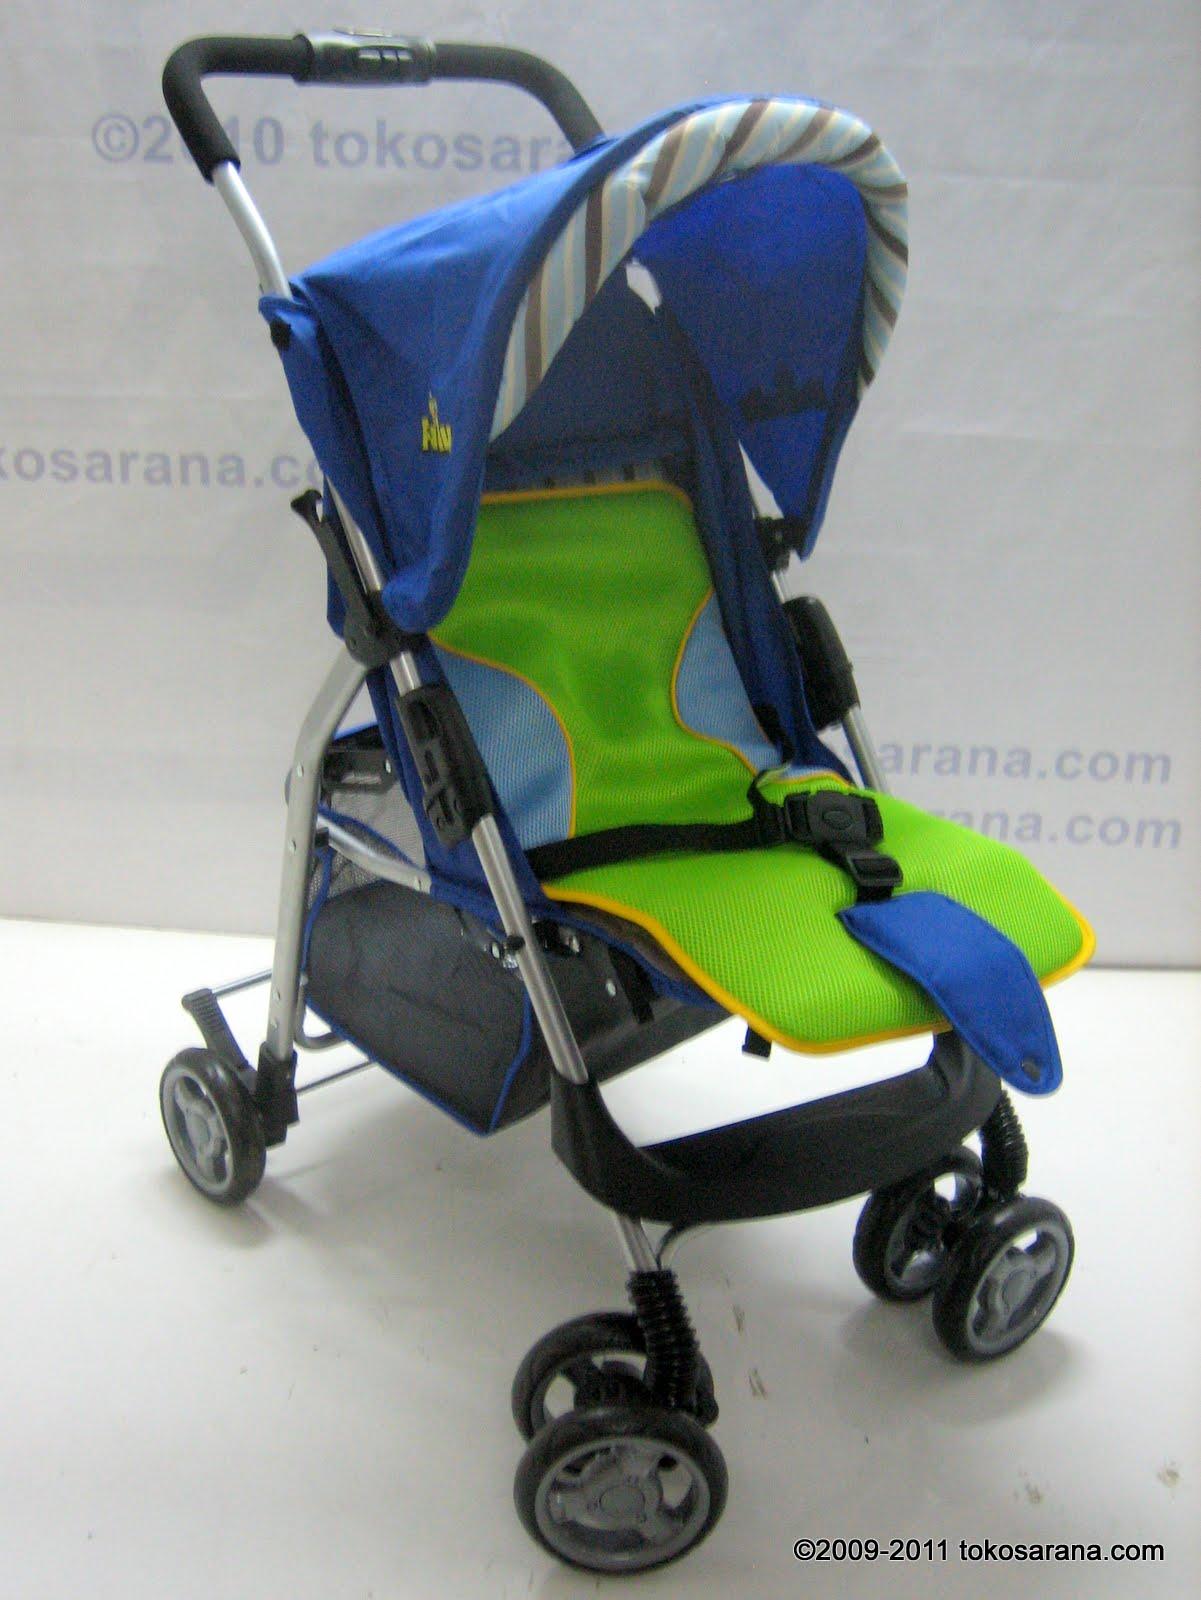 swing chair mudah medical shower cvs tokosaranajakarta jatinegara kereta bayi family shopper